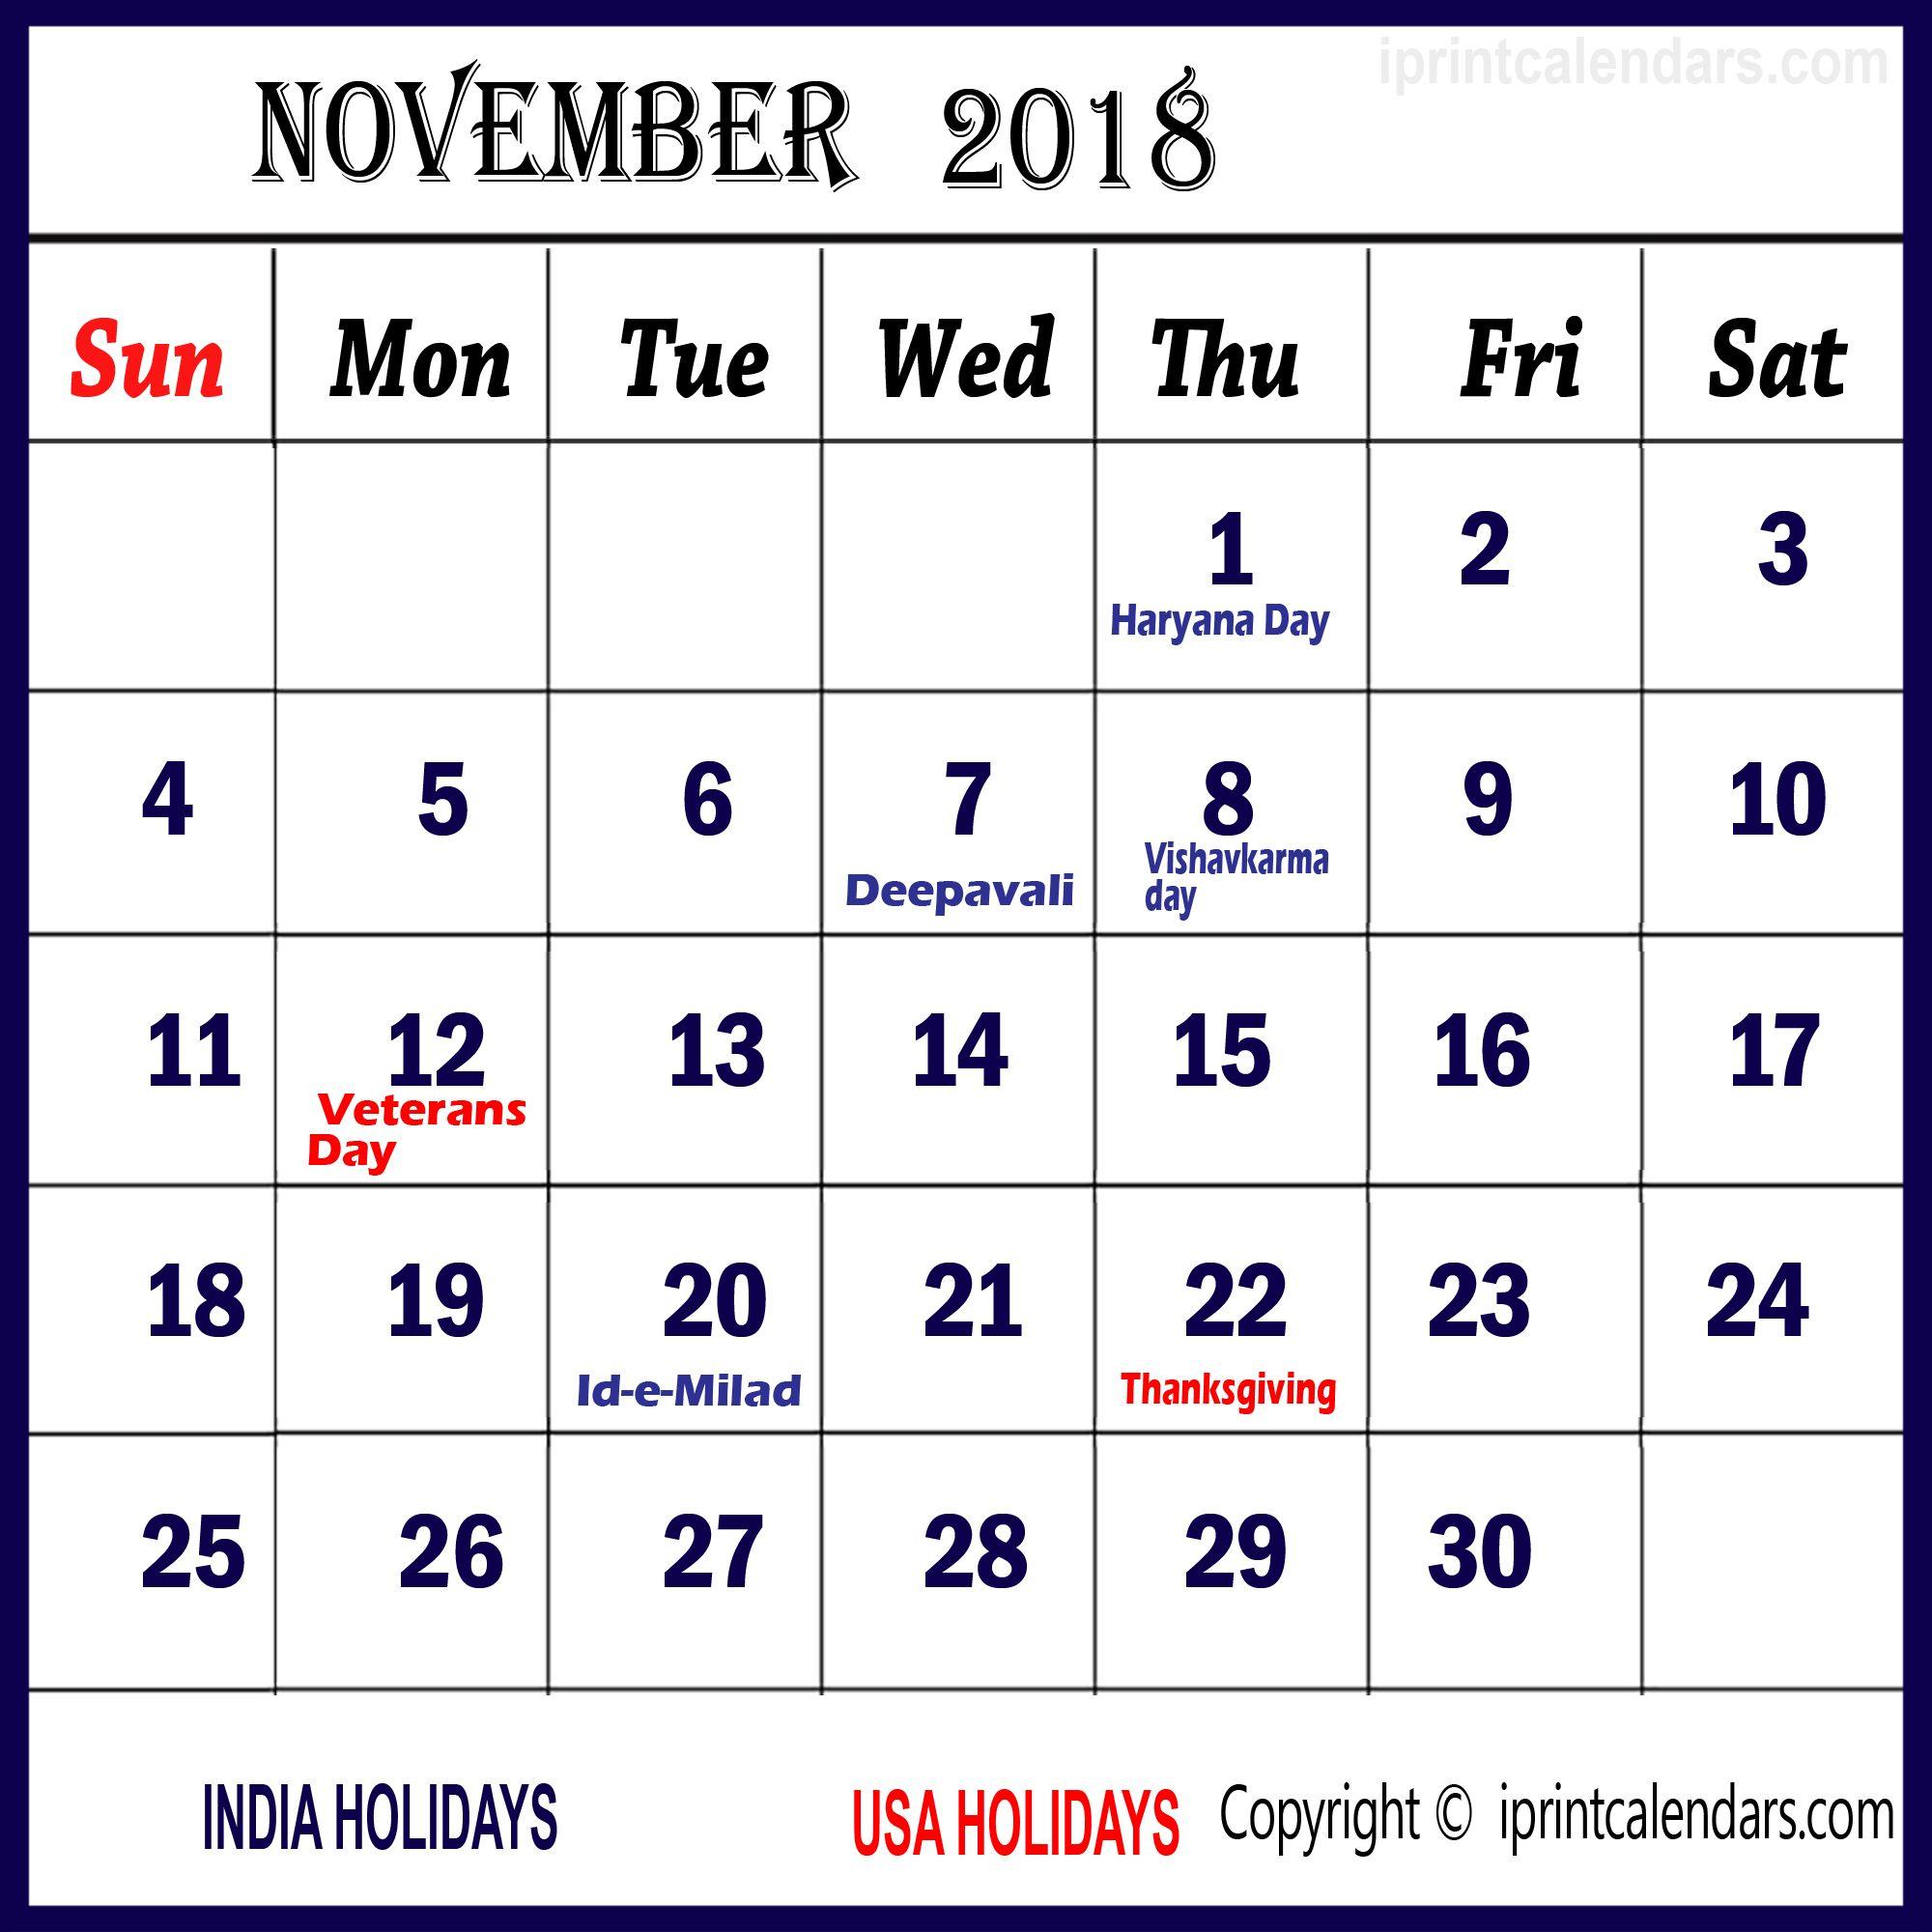 November 2018 Calendar Holidays India November Holidays 2018